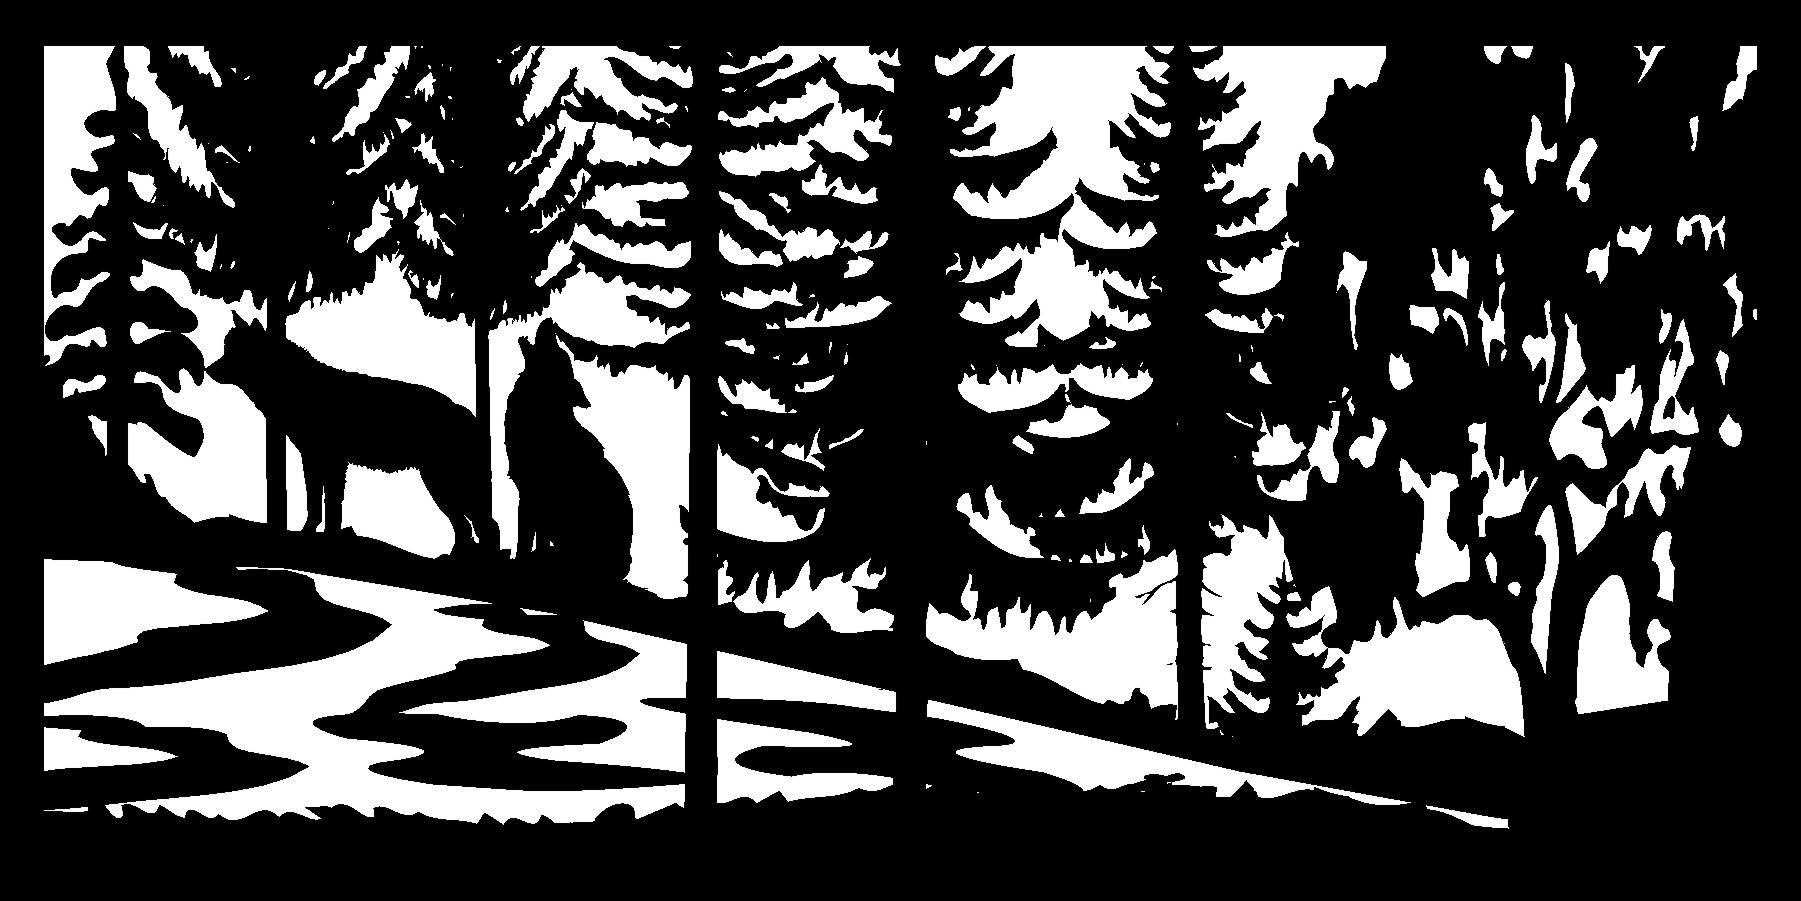 30 X 60 Two Wolves River B Plasma Metal Art DXF File